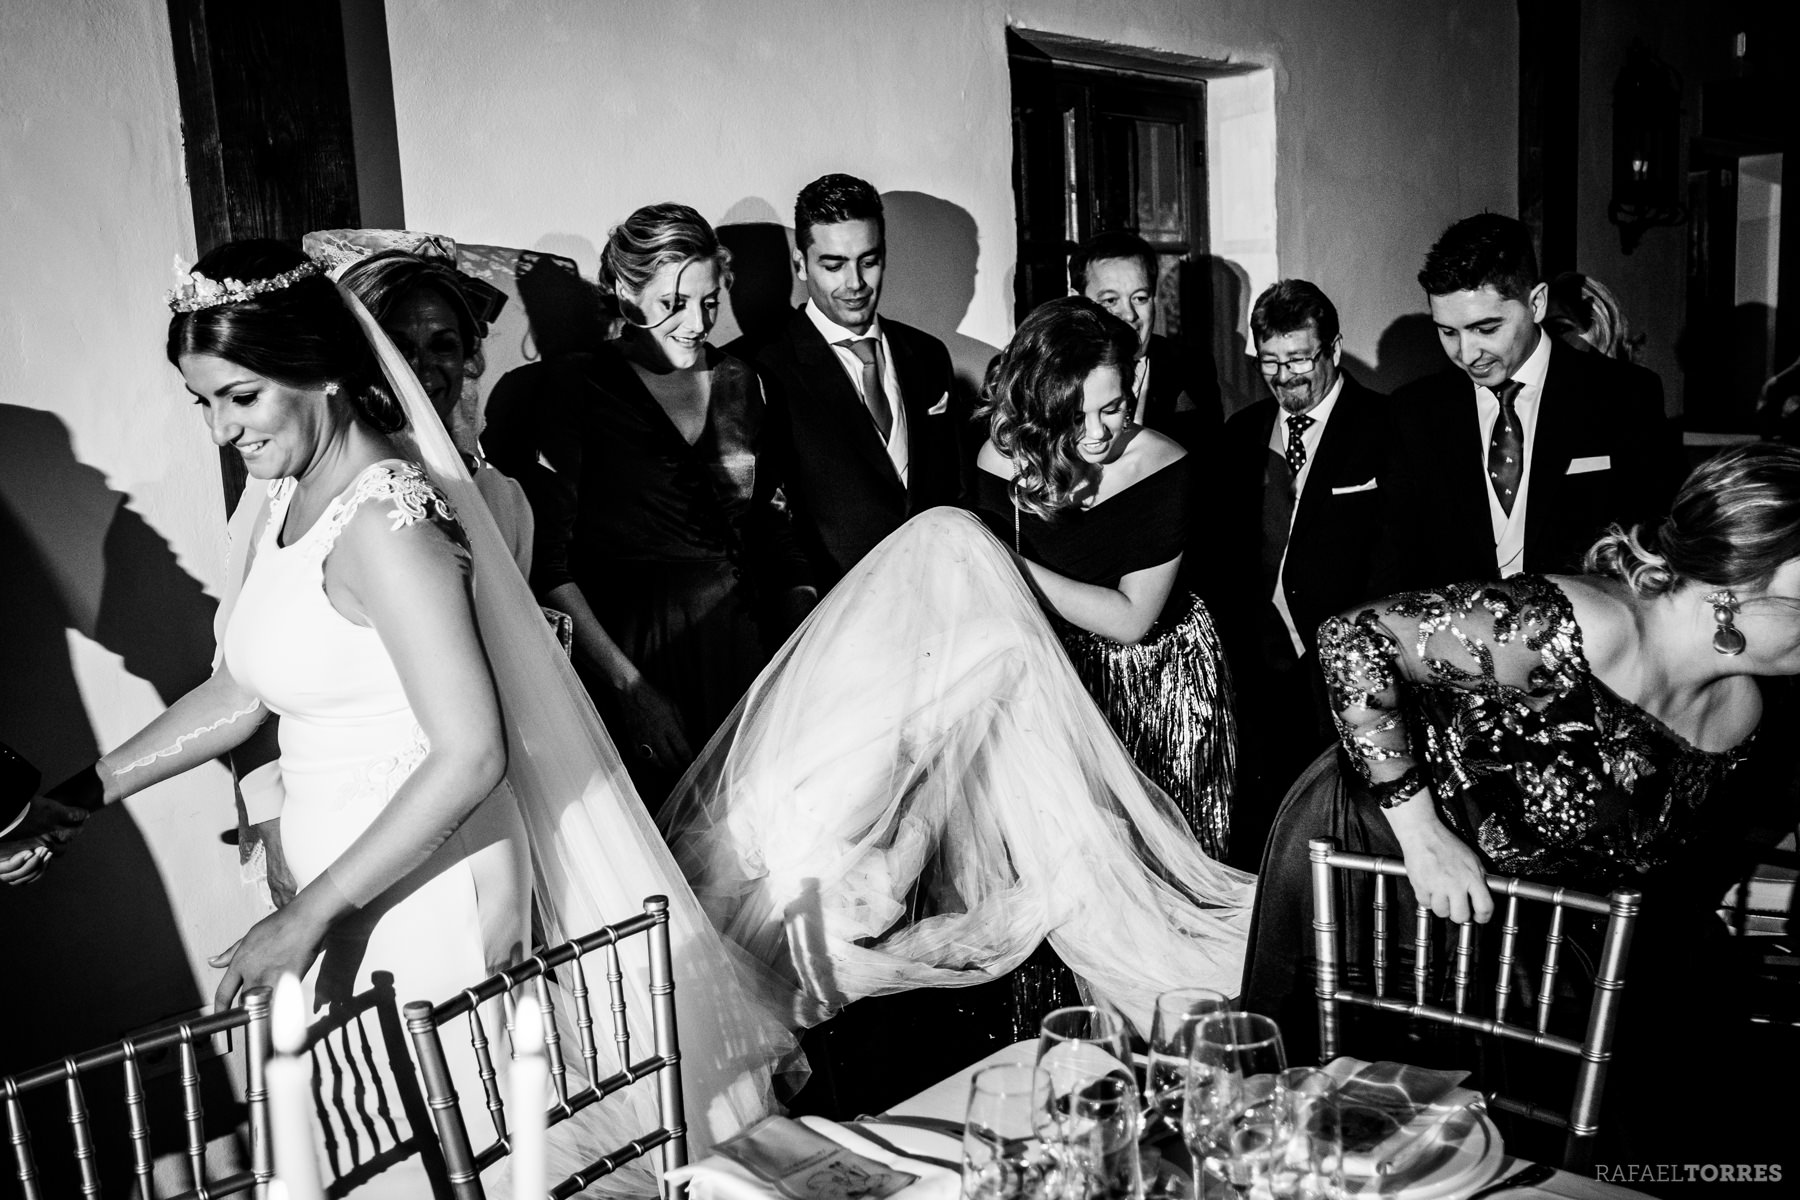 bea-juan-carmona-fotografo-boda-en-sevilla-rafael-torres-photo-47.jpg